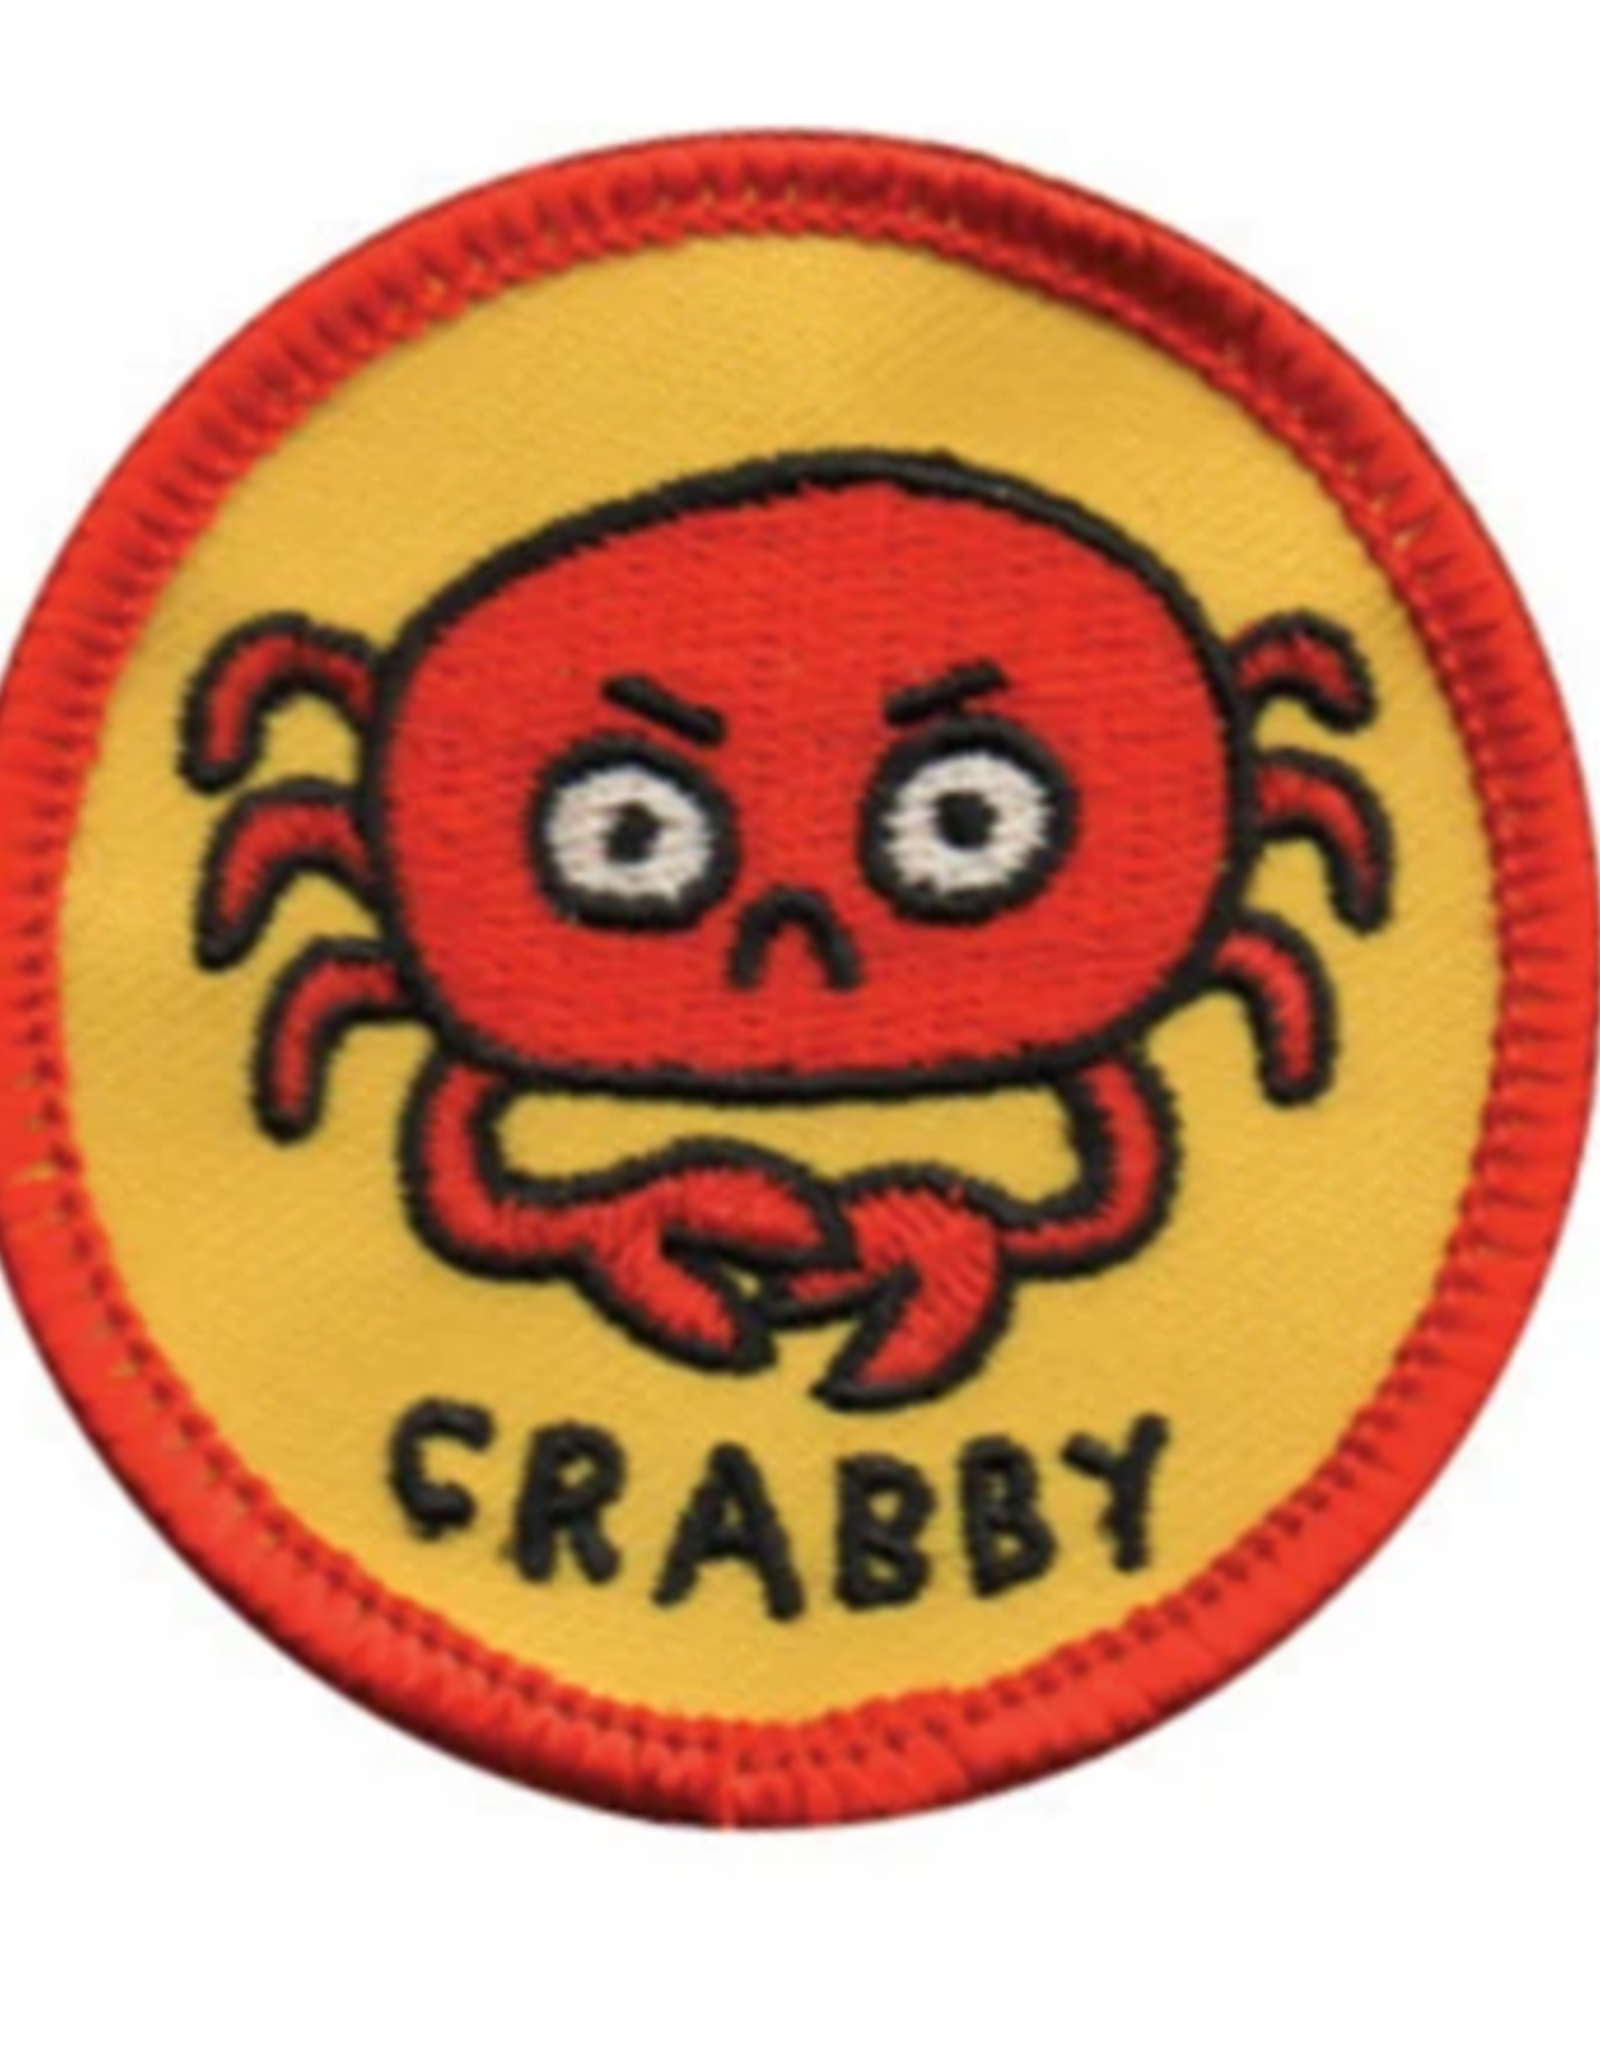 Badge Bomb Crabby Patch